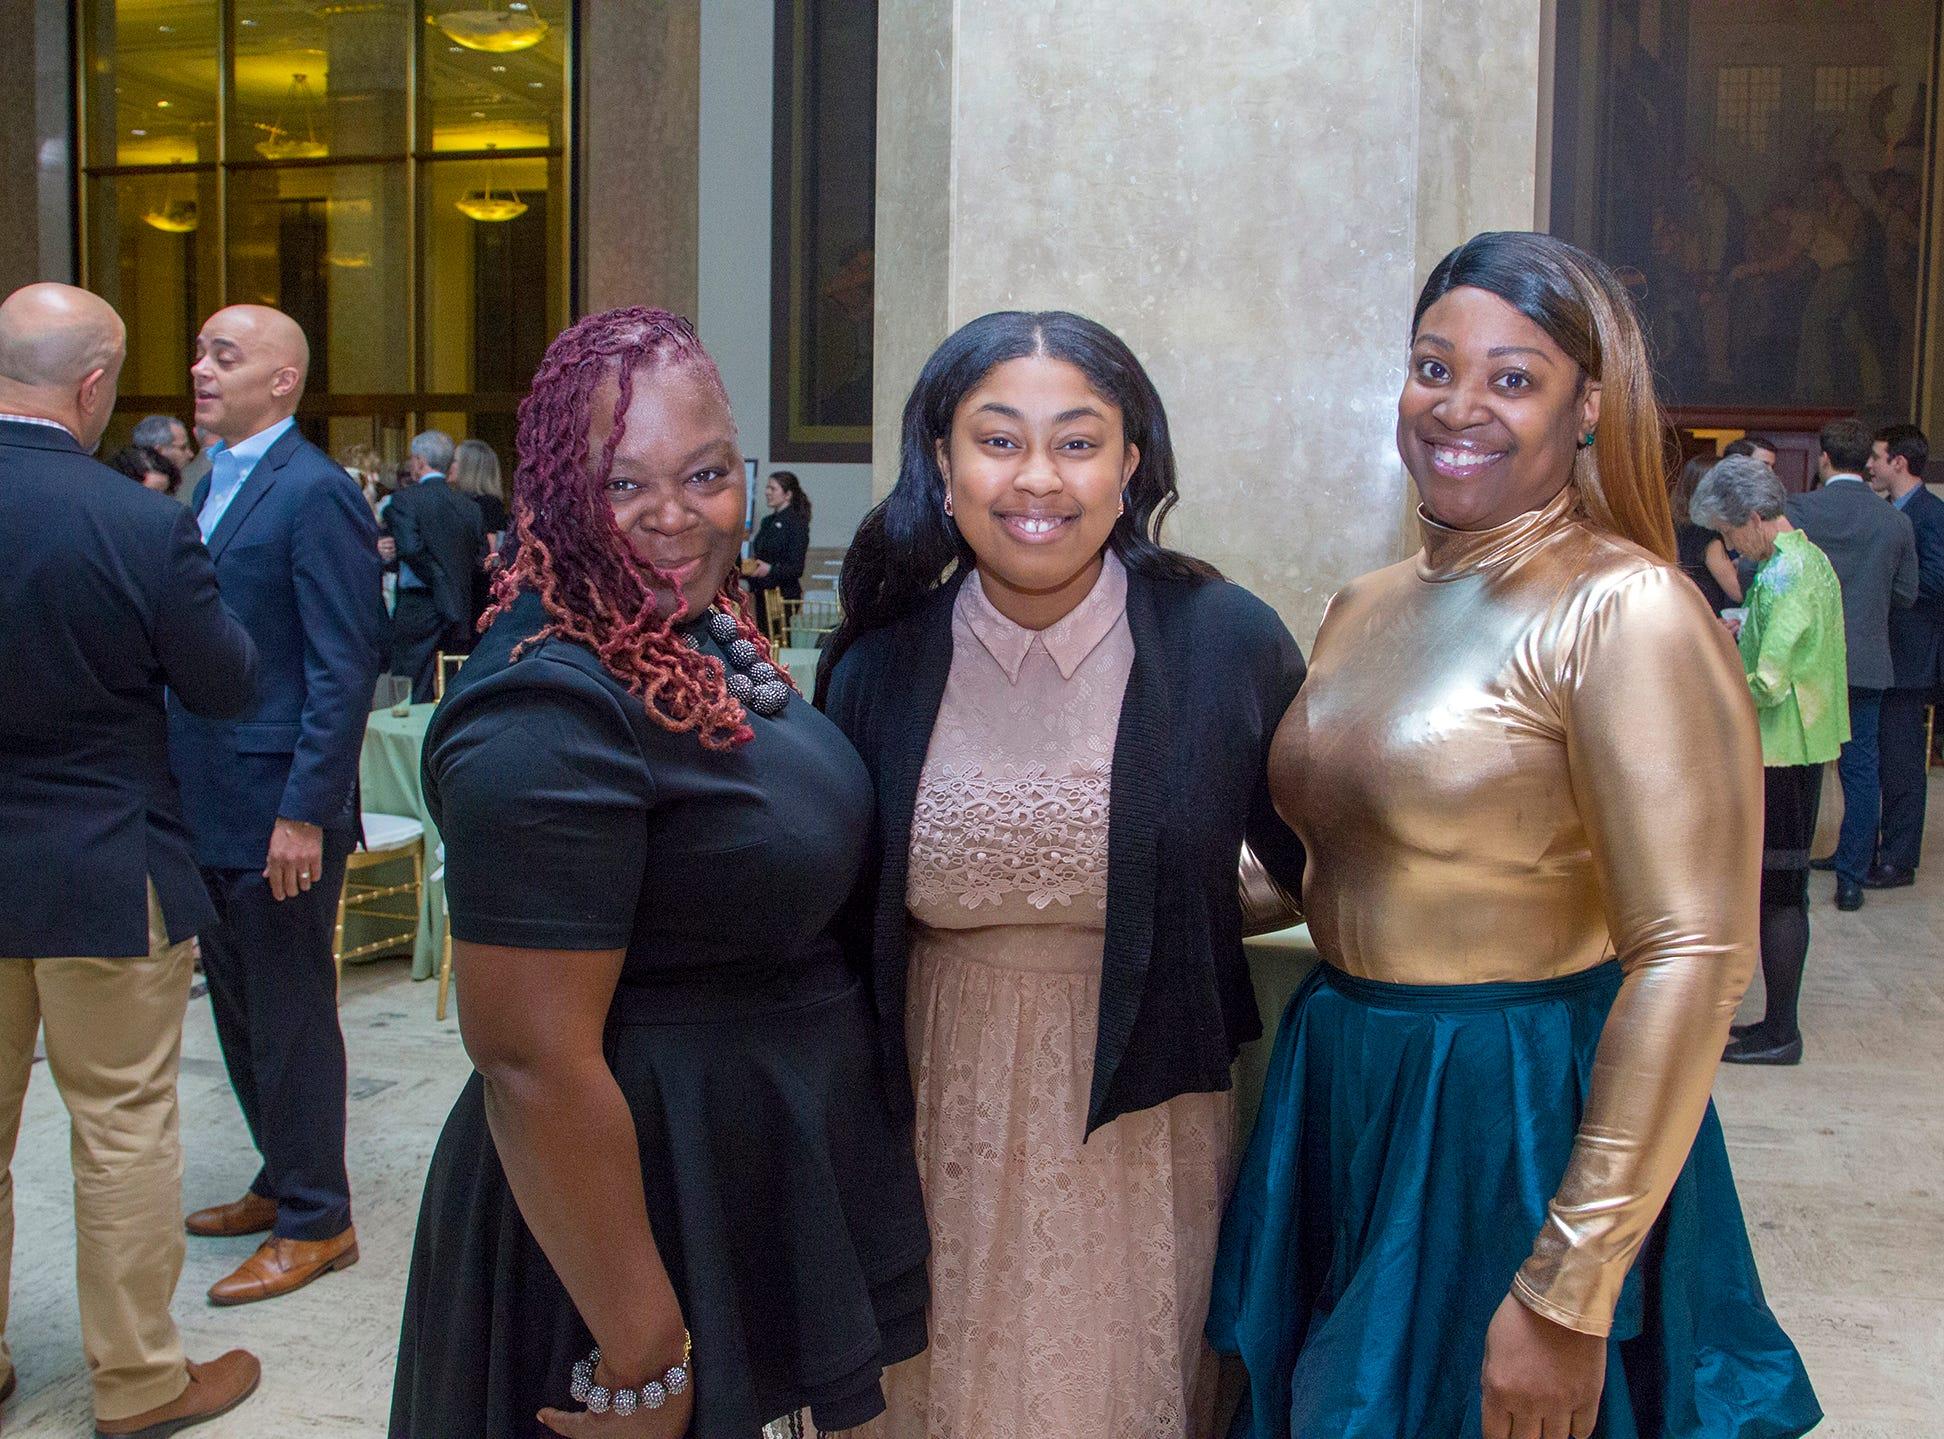 Keisha Archibald, Danielle Brathwaite, Athena Davis-Shaw. Philip's Education Partners host The Dream Maker 30th anniversary gala at The Mezzanine in Newark 3/29/2019.